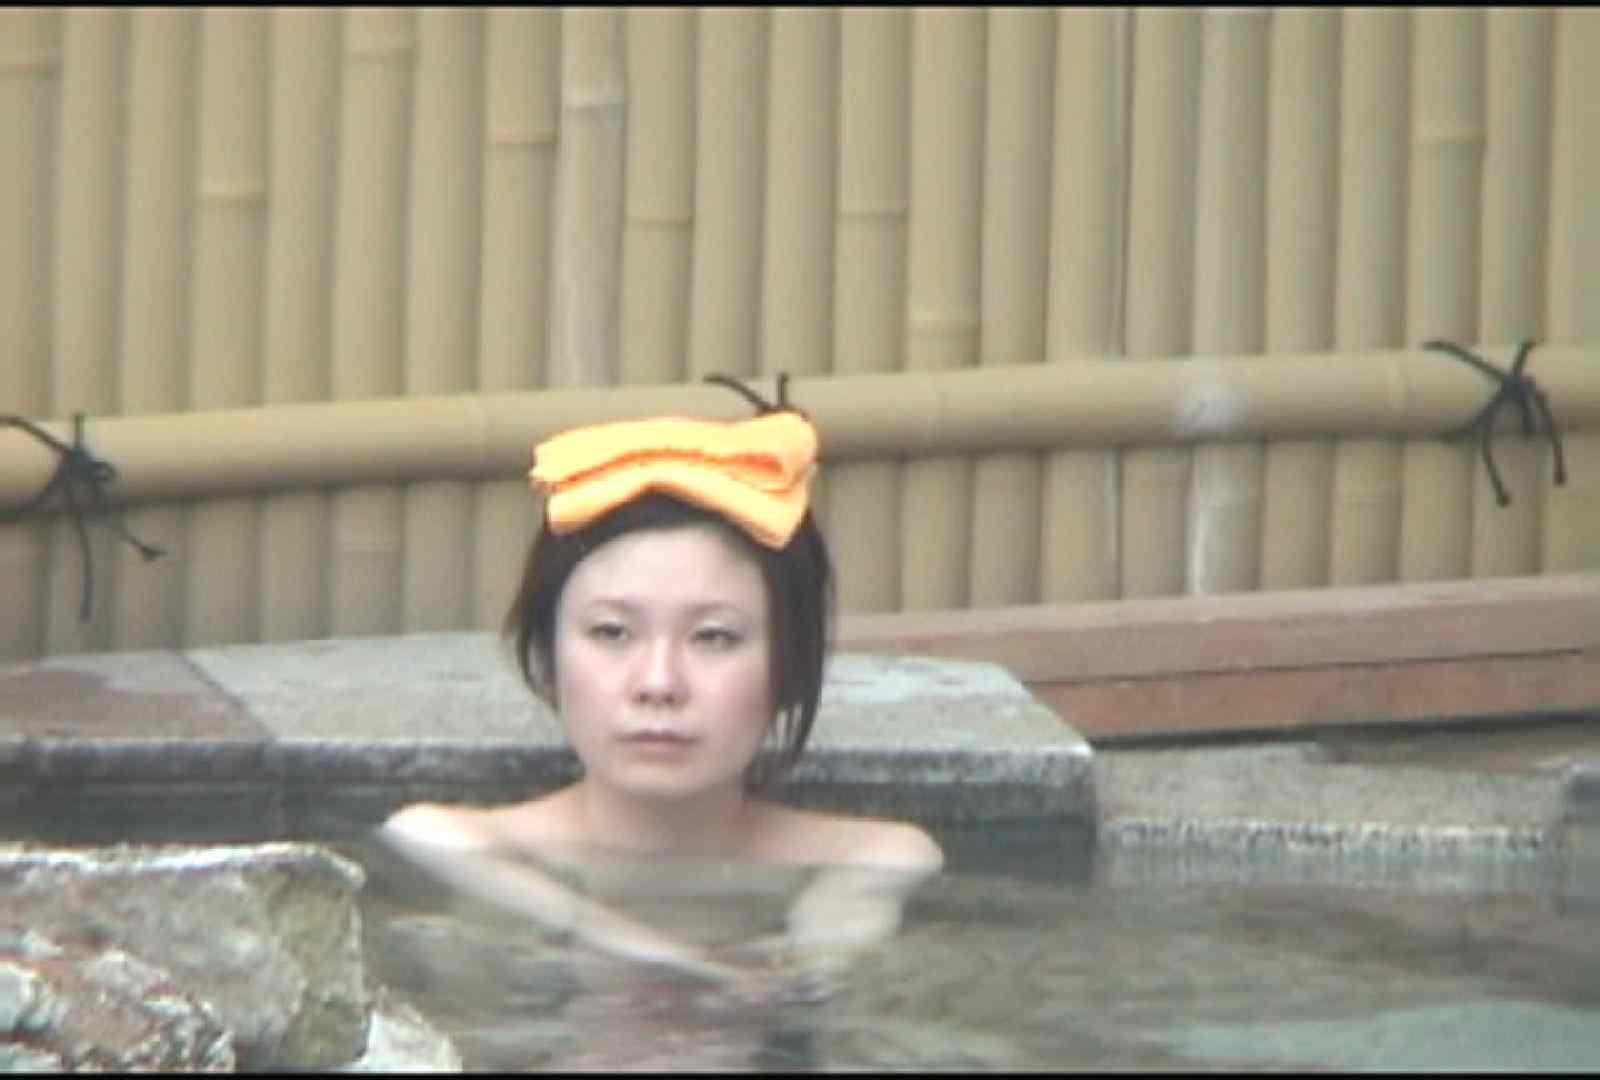 Aquaな露天風呂Vol.177 綺麗なOLたち アダルト動画キャプチャ 112枚 35